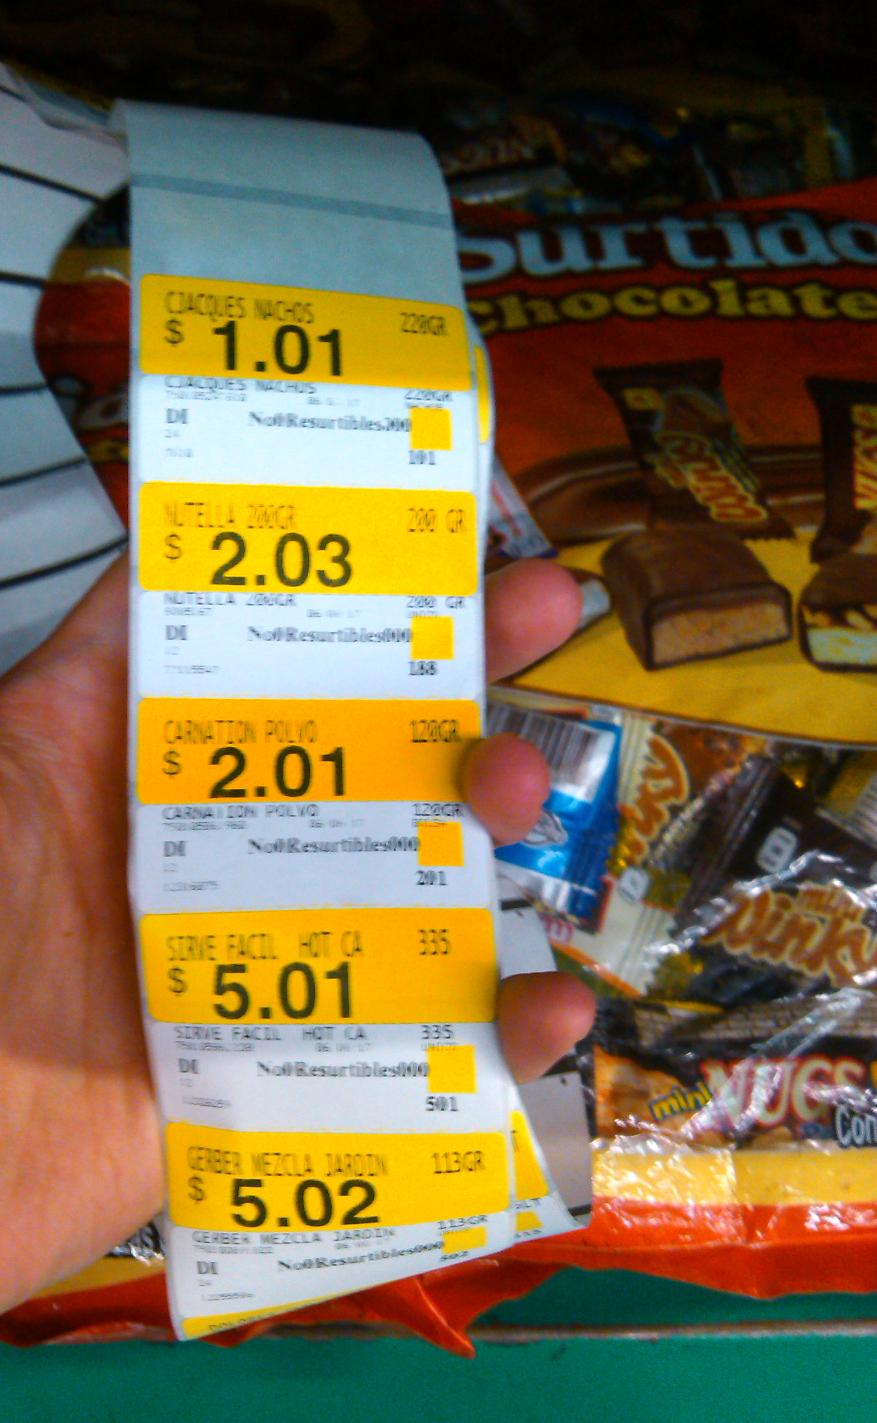 Bodega Aurrerá: nutella 200gr a $2.03